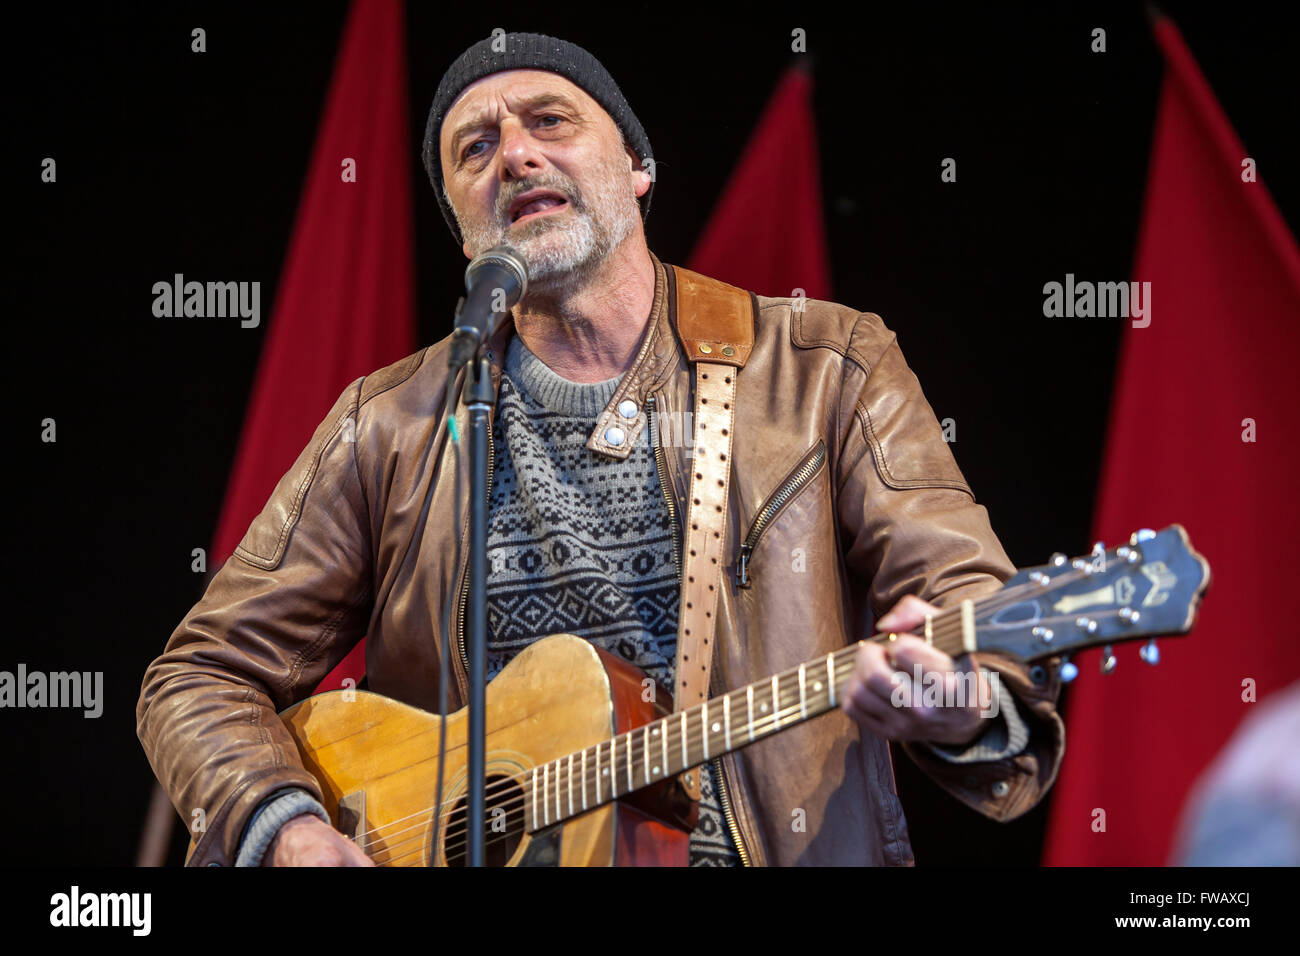 Copenhagen, Denmark, April 2nd, 2016. Musician Allan Olsen performs at the memorial gathering in Copenhagen on the - Stock Image